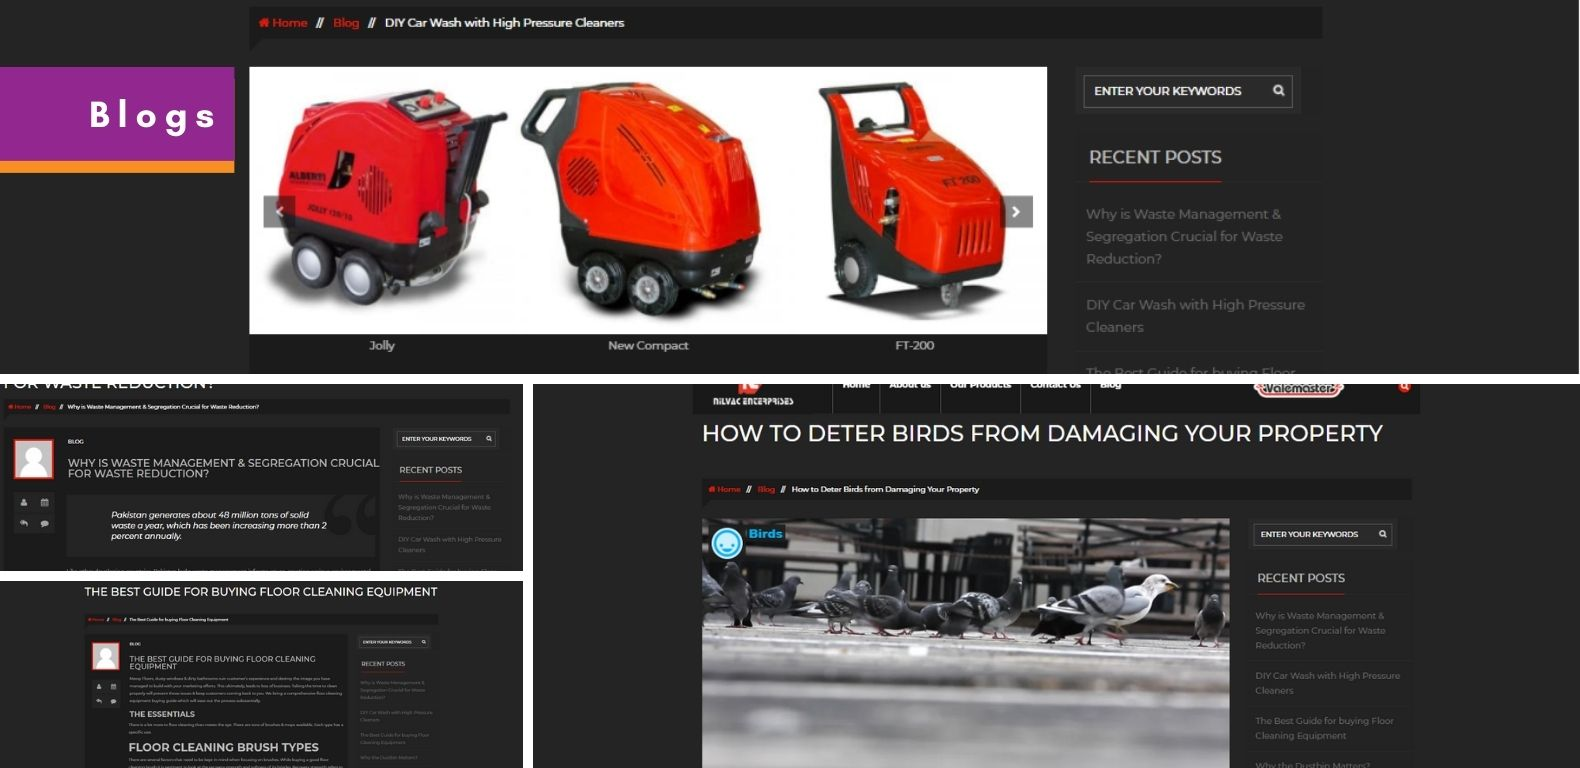 SEO-Nilvac-Enterprises-Blog-Posts